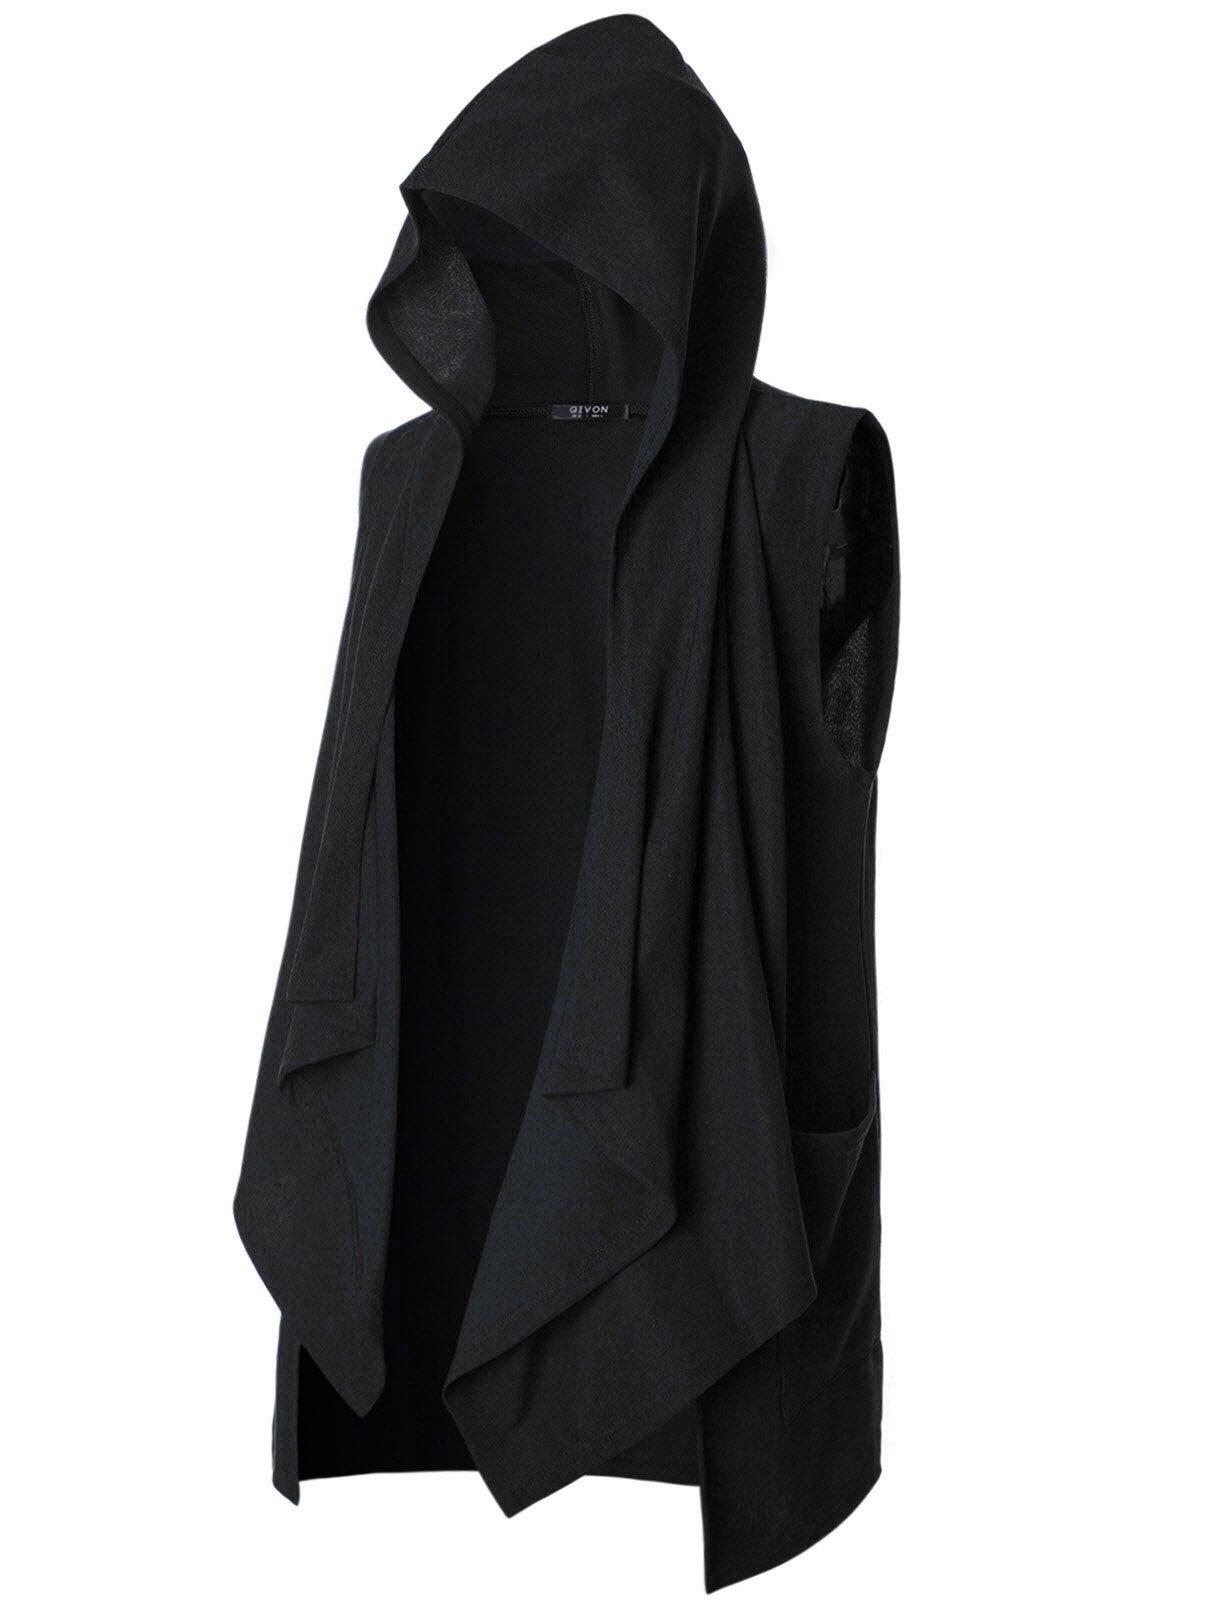 GIVON Mens Sleeveless Ruffle Shawl Collar Cardigan With Pockets/DCC035-BLACK-M